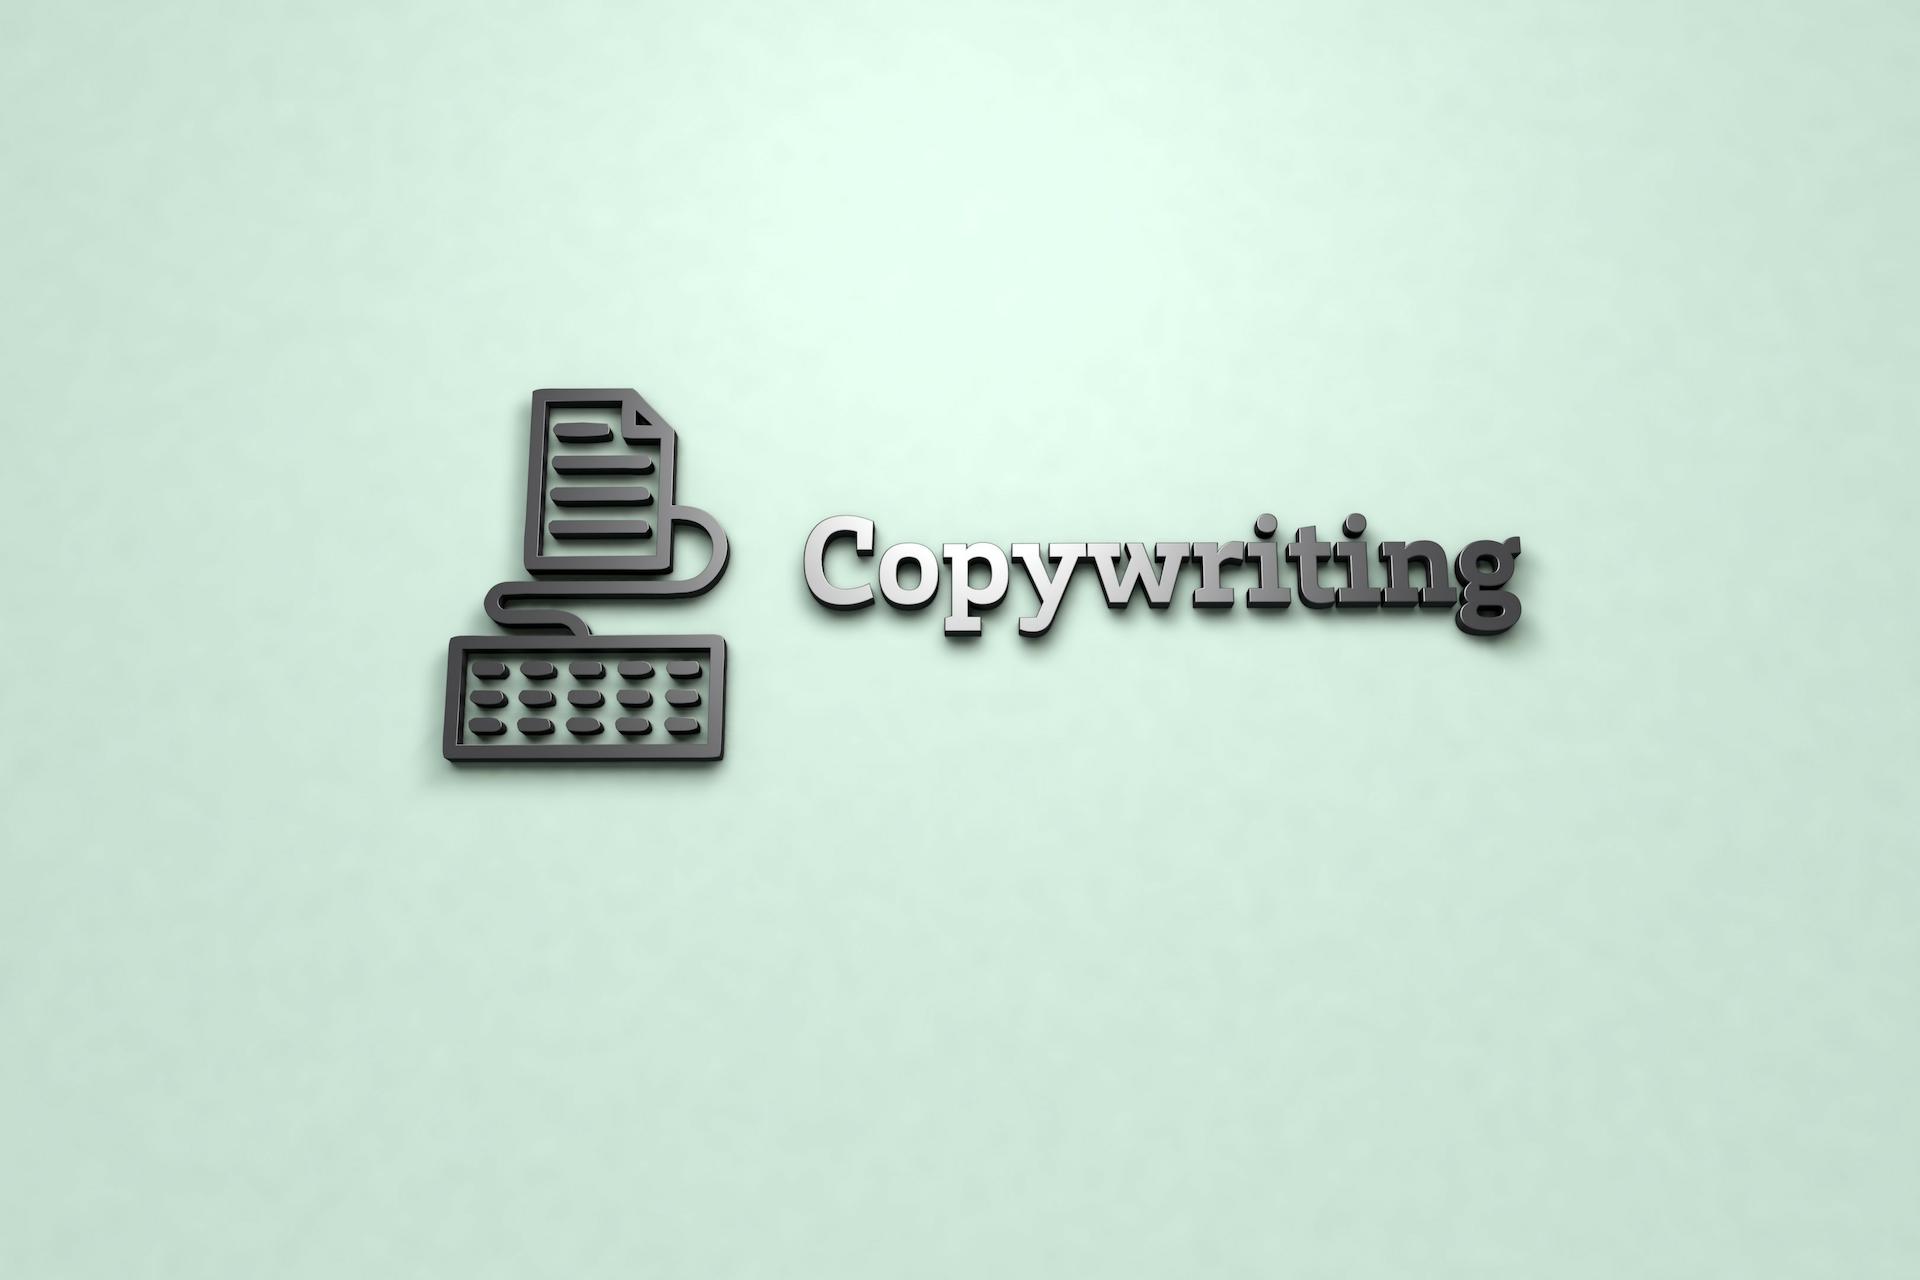 الـ Copywriting